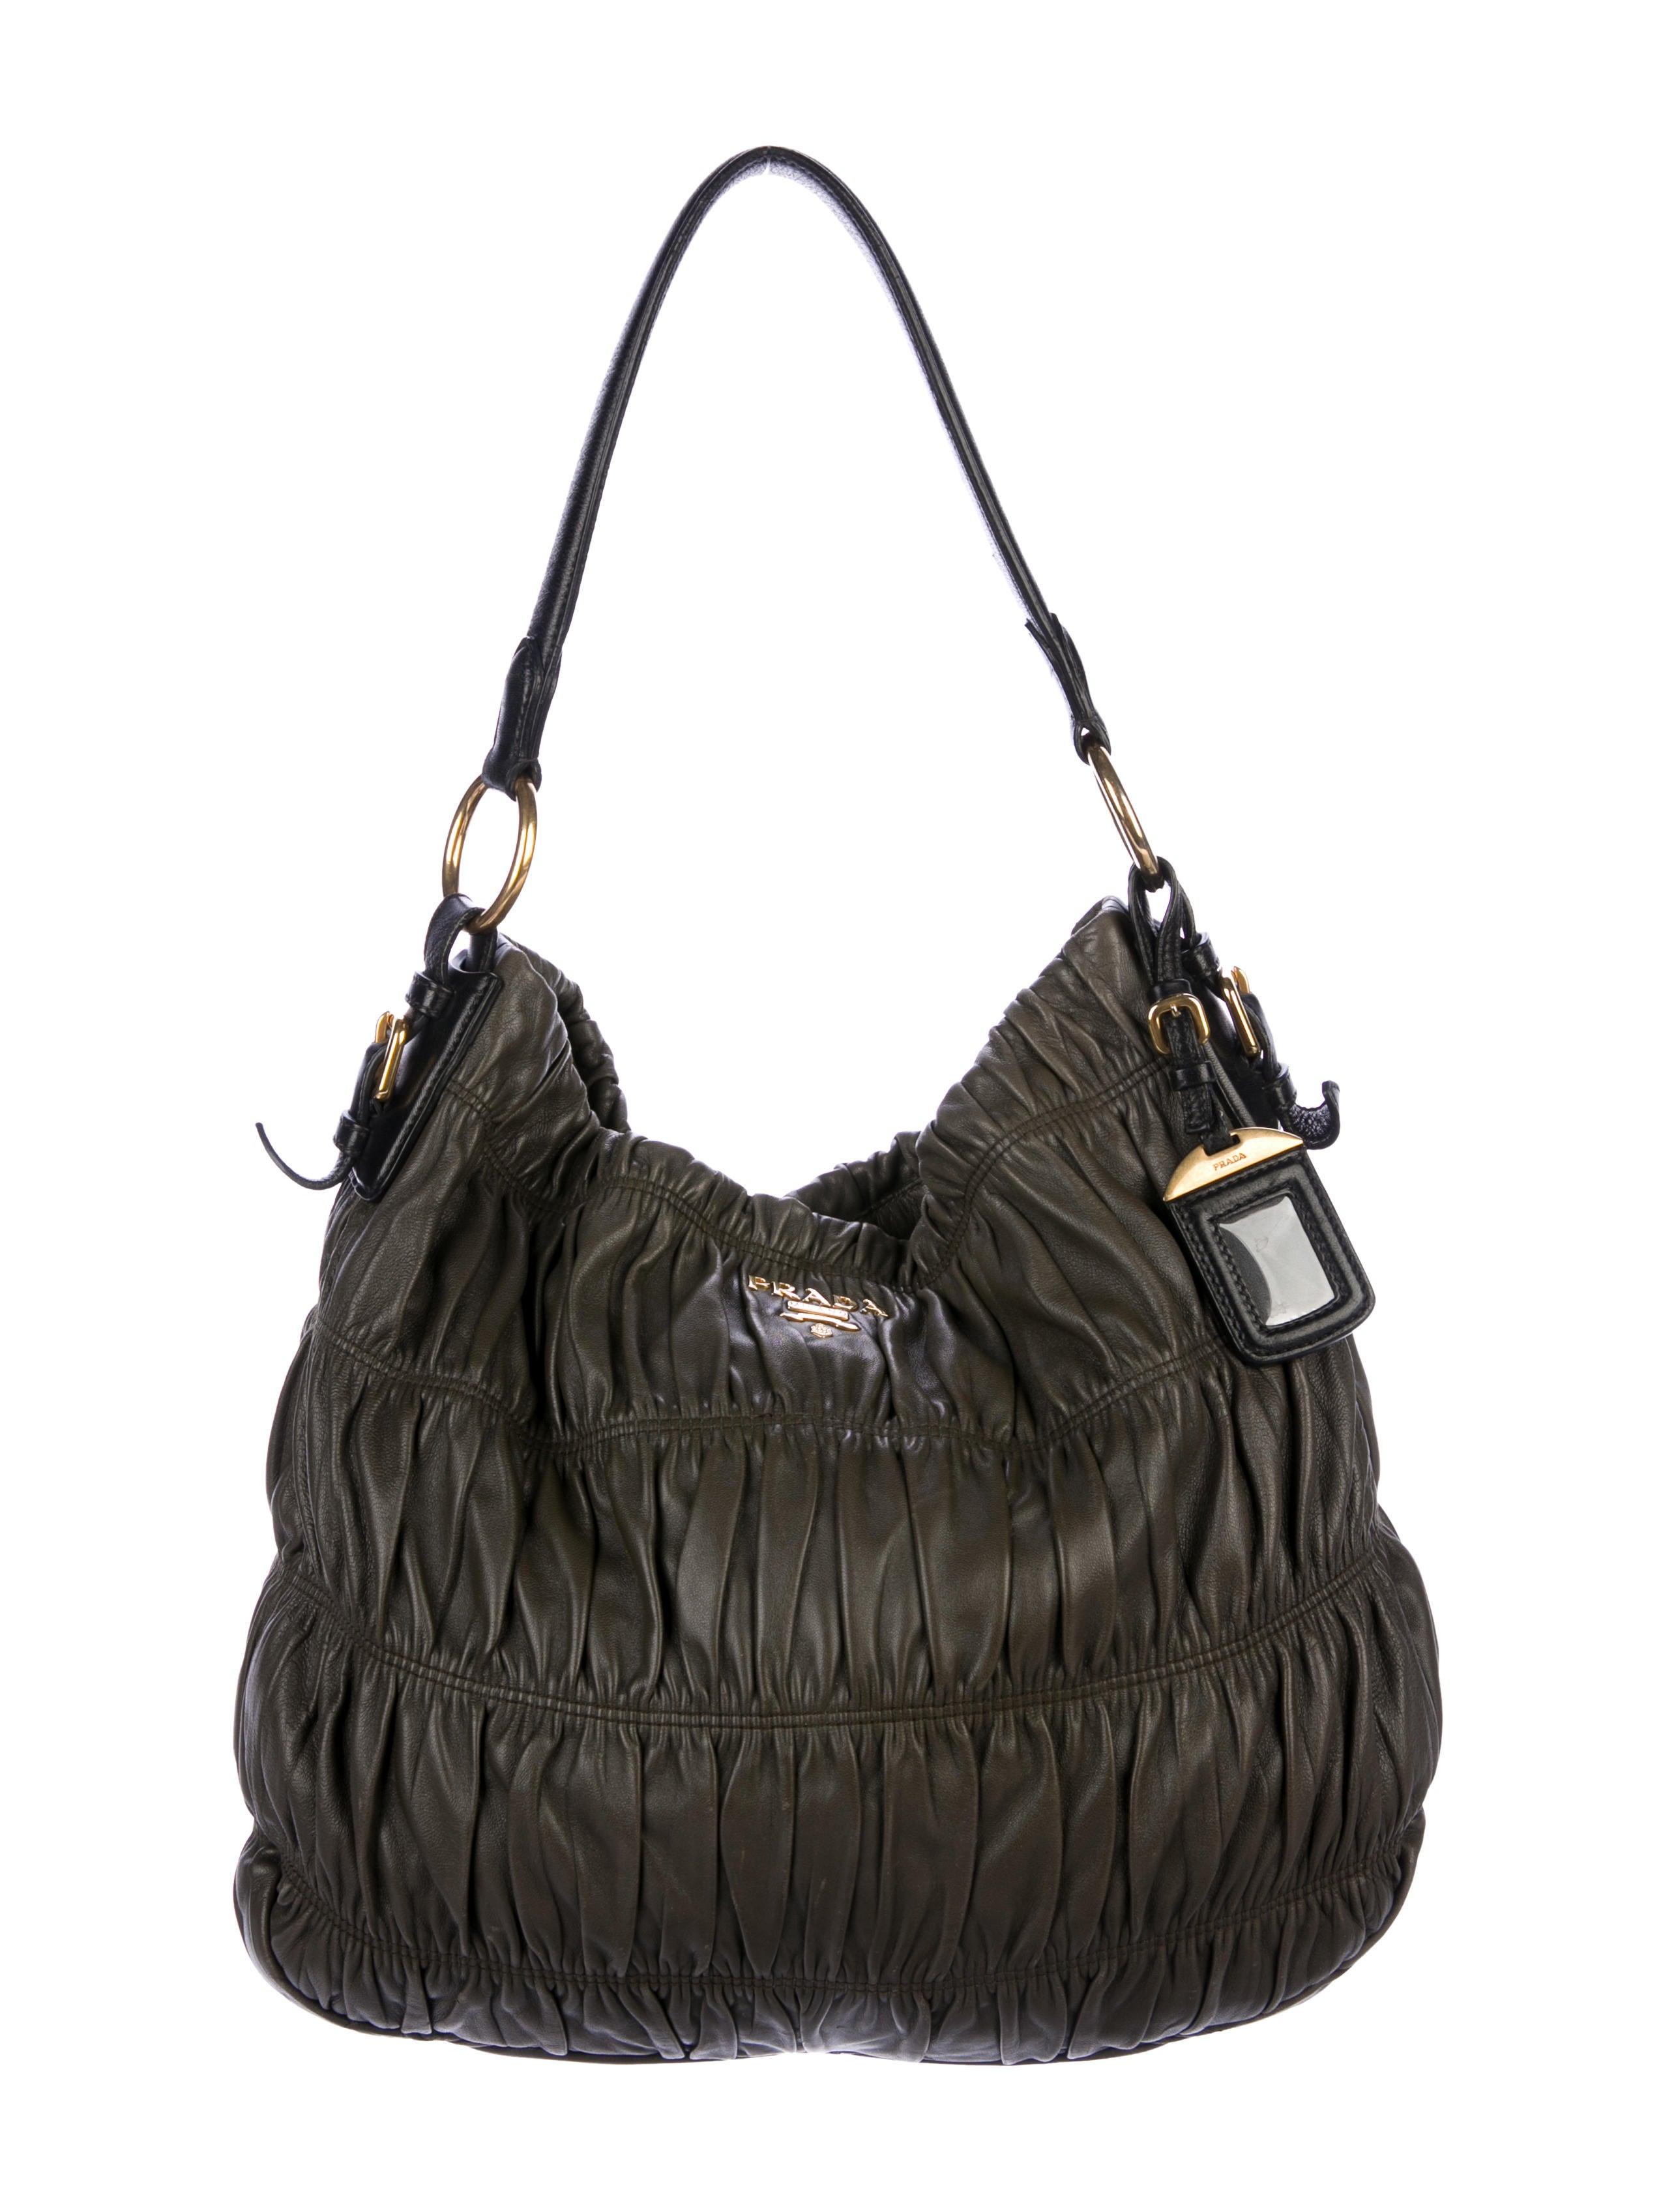 cee7d73f74f5 Prada Nappa Gaufre Satchel - Handbags - PRA239368 | The RealReal